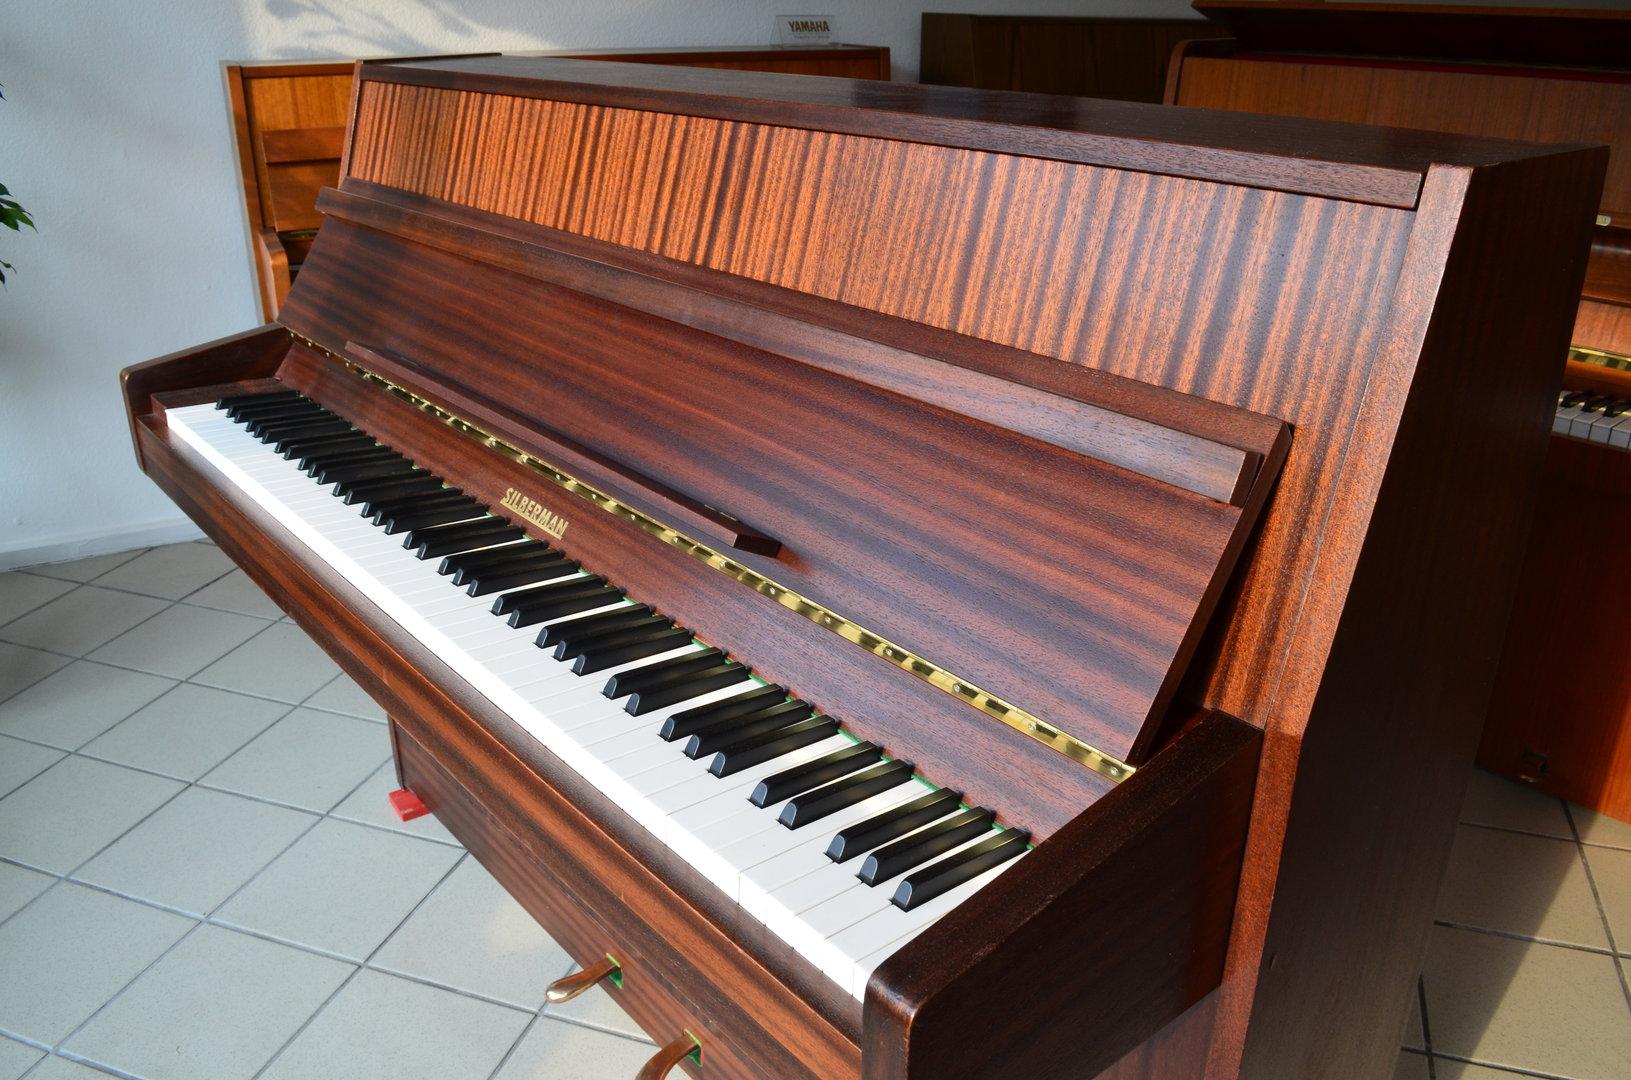 markenklaviere ab 599 silbermann klavier. Black Bedroom Furniture Sets. Home Design Ideas